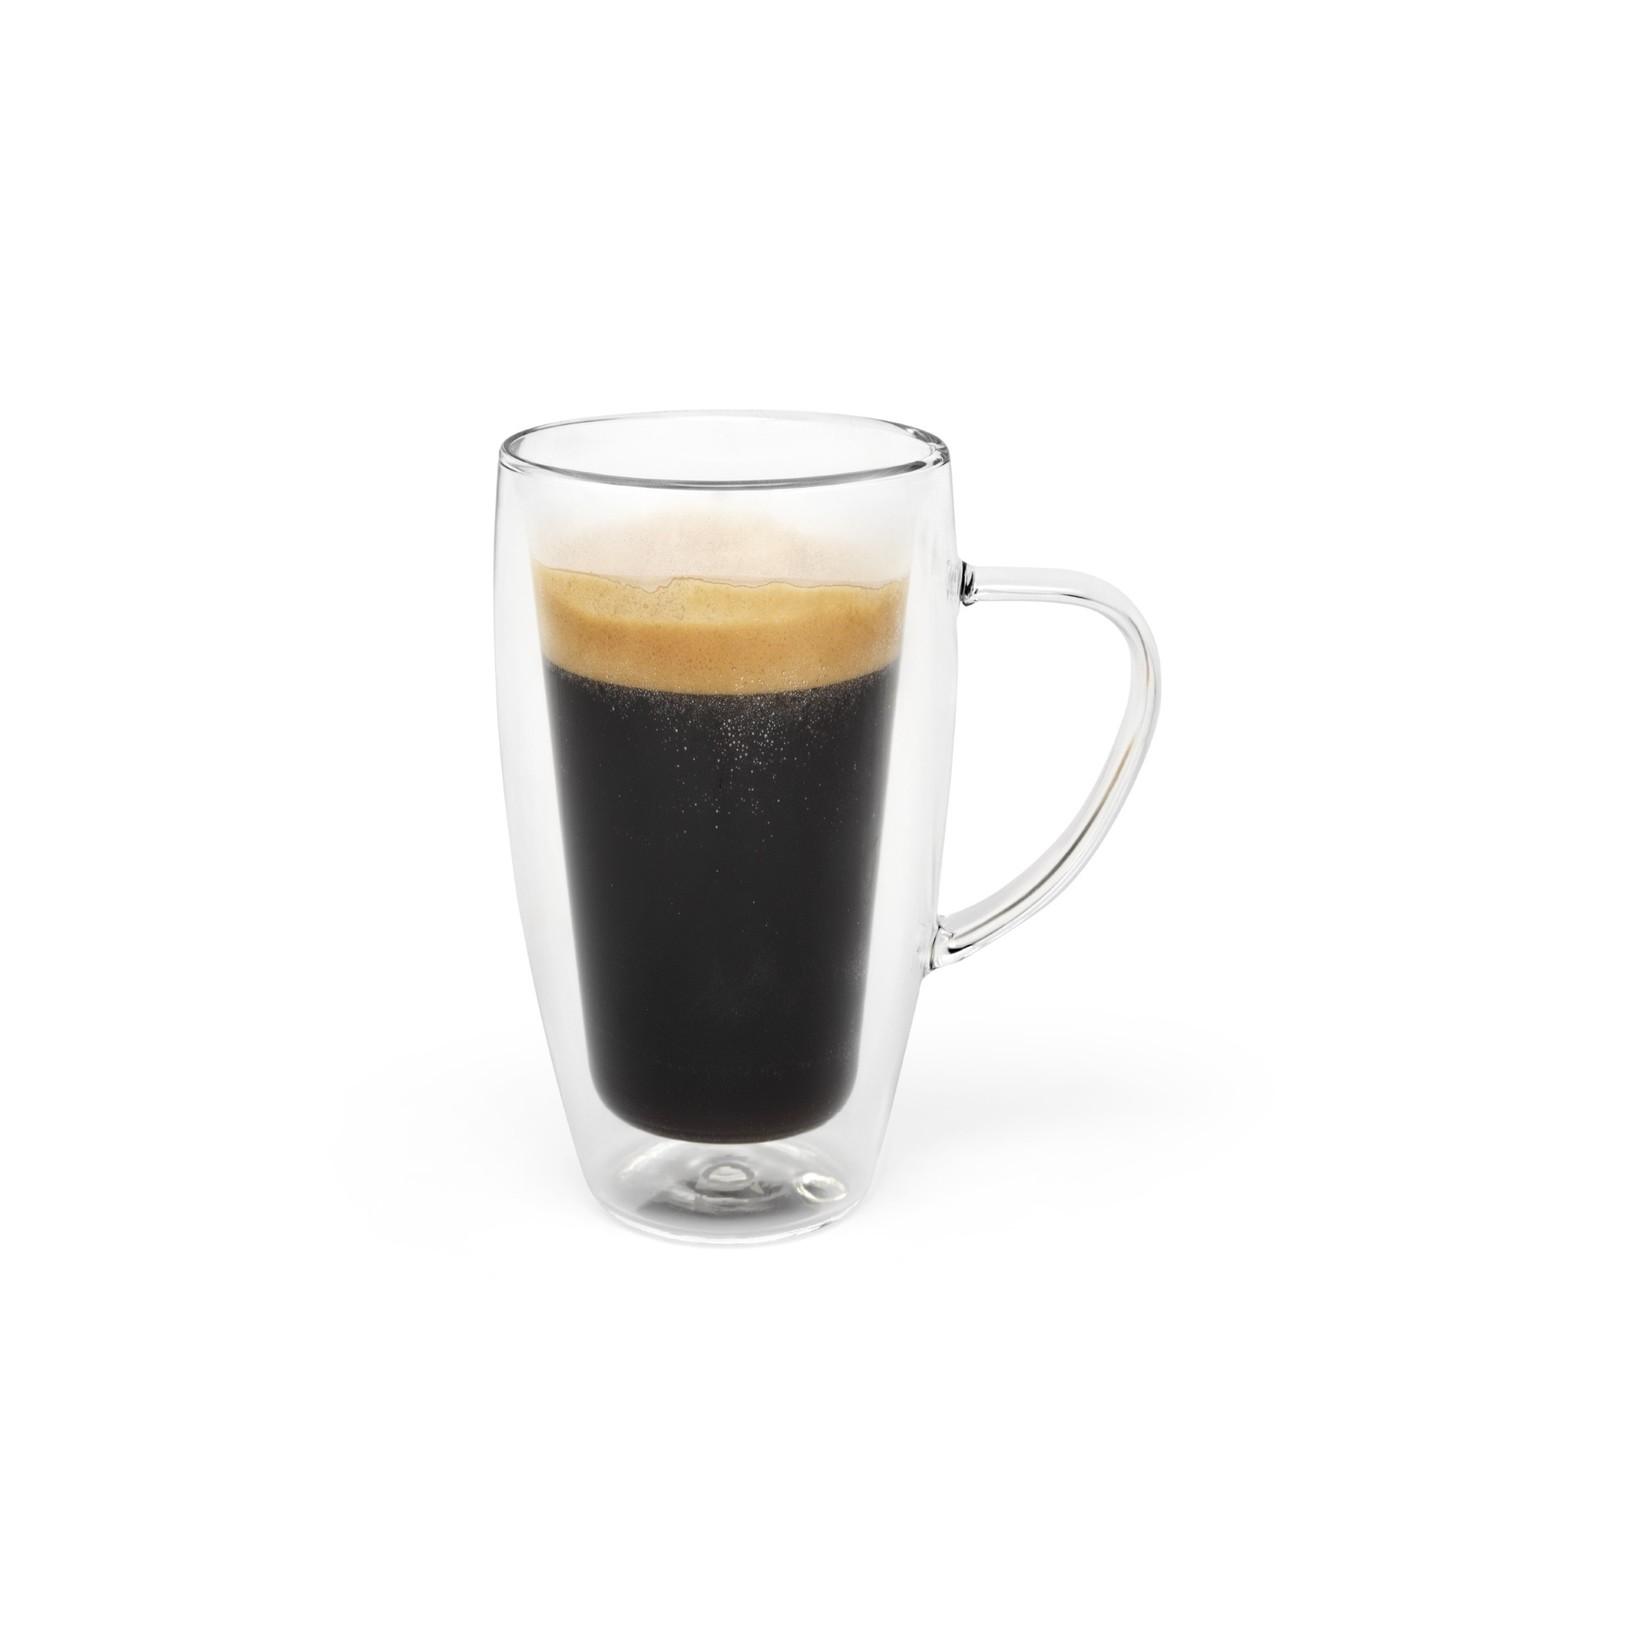 Bredemeijer Bredemeijer Dubbelwandinge koffie of theeglas DUO set van 2  320ml